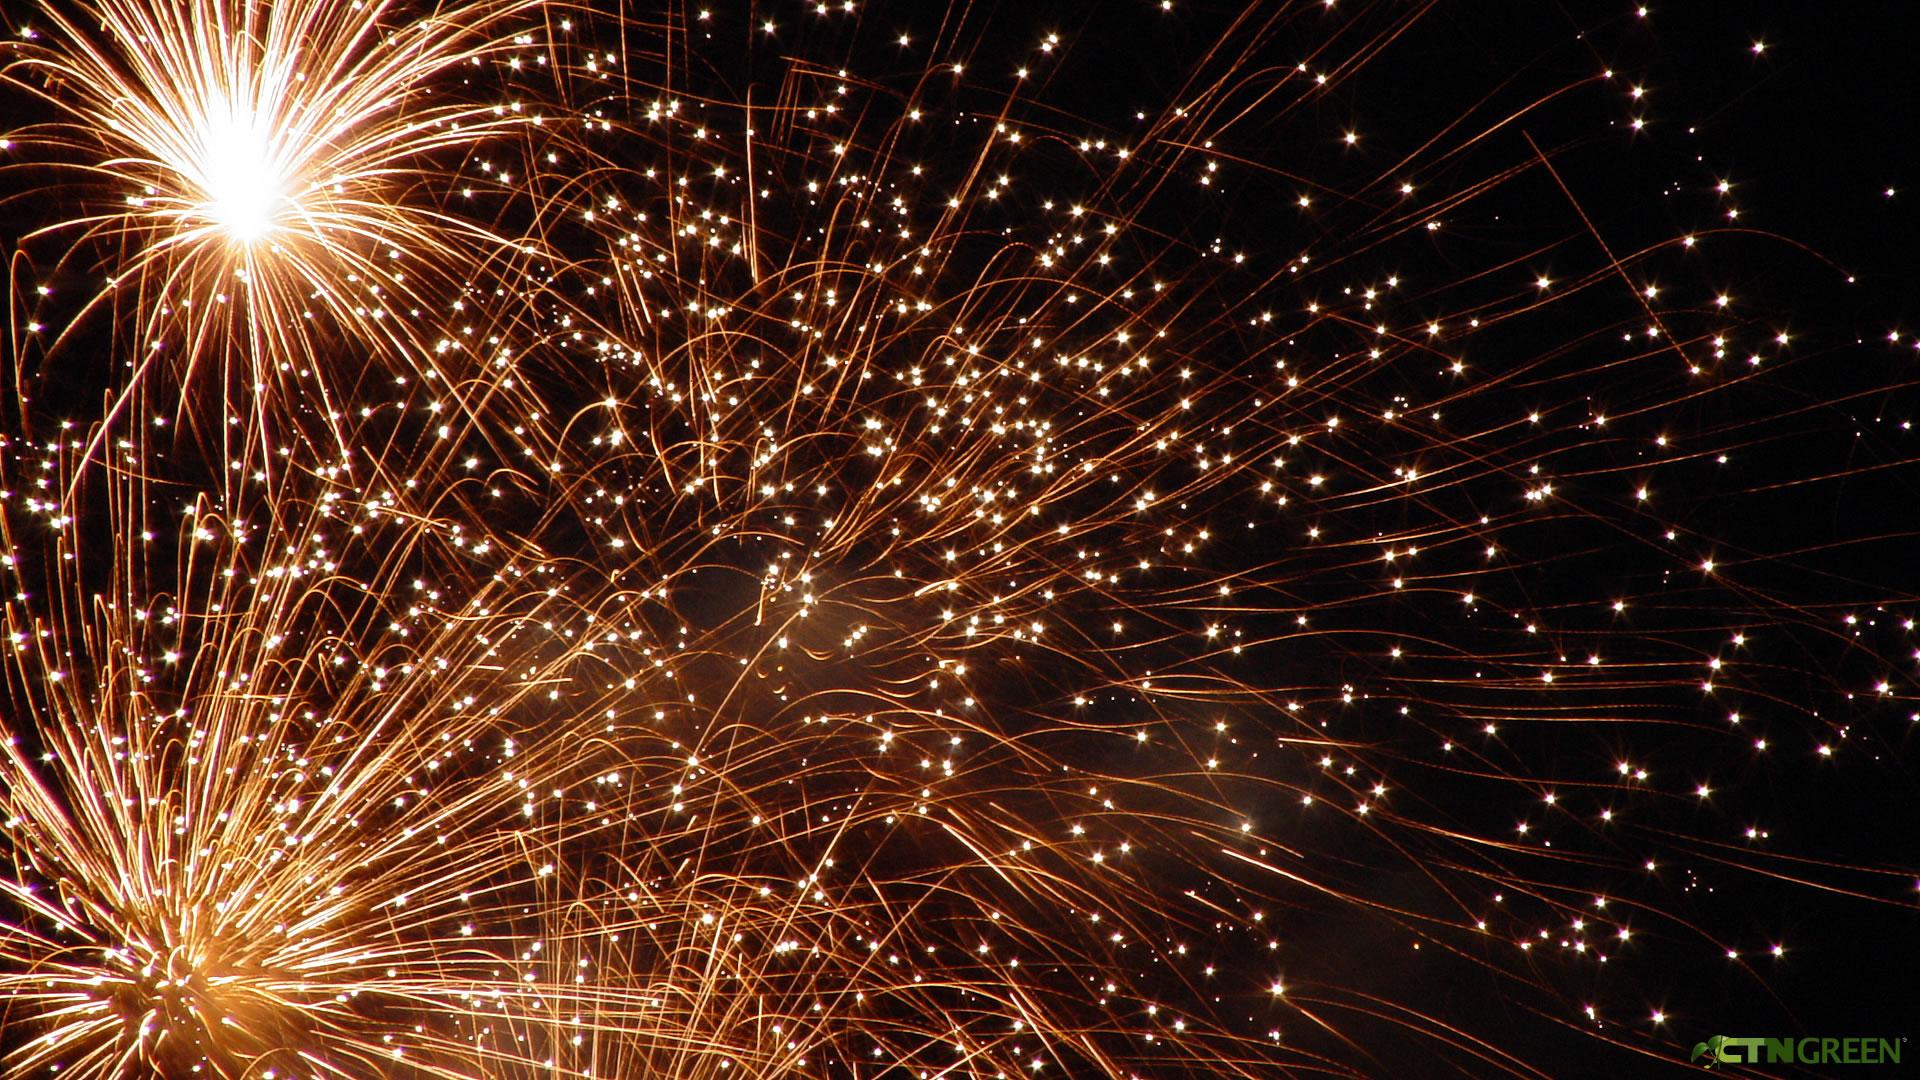 Fireworks-Screen-Savers-Photos-Freebee-653134.jpg